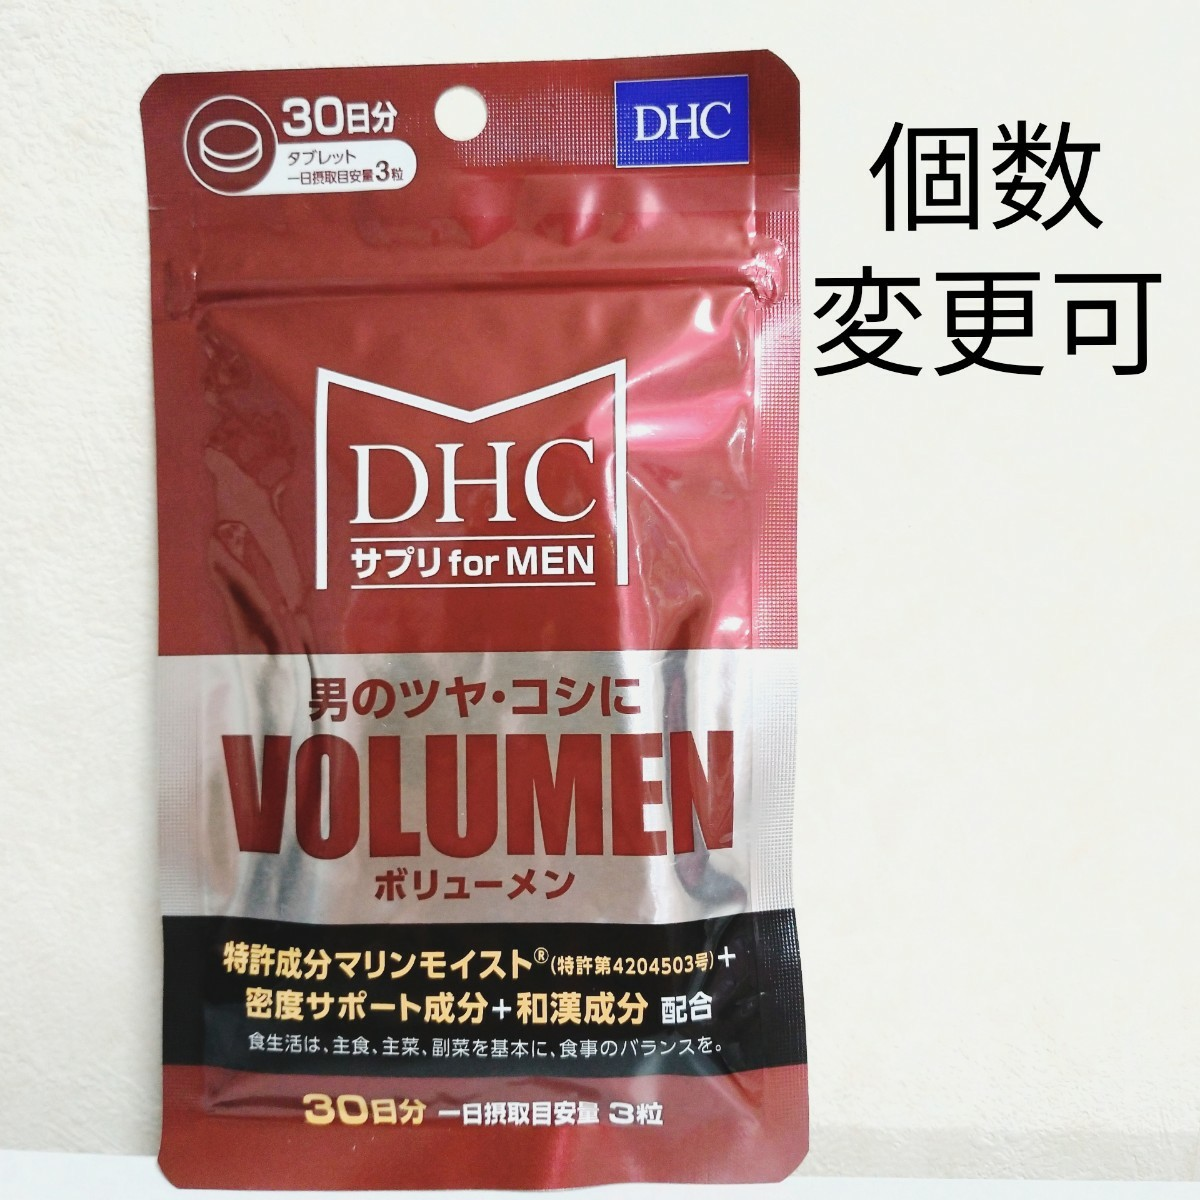 DHC MEN'sサプリVOLUMEN(ボリューメン) 30日分×2袋 個数変更可